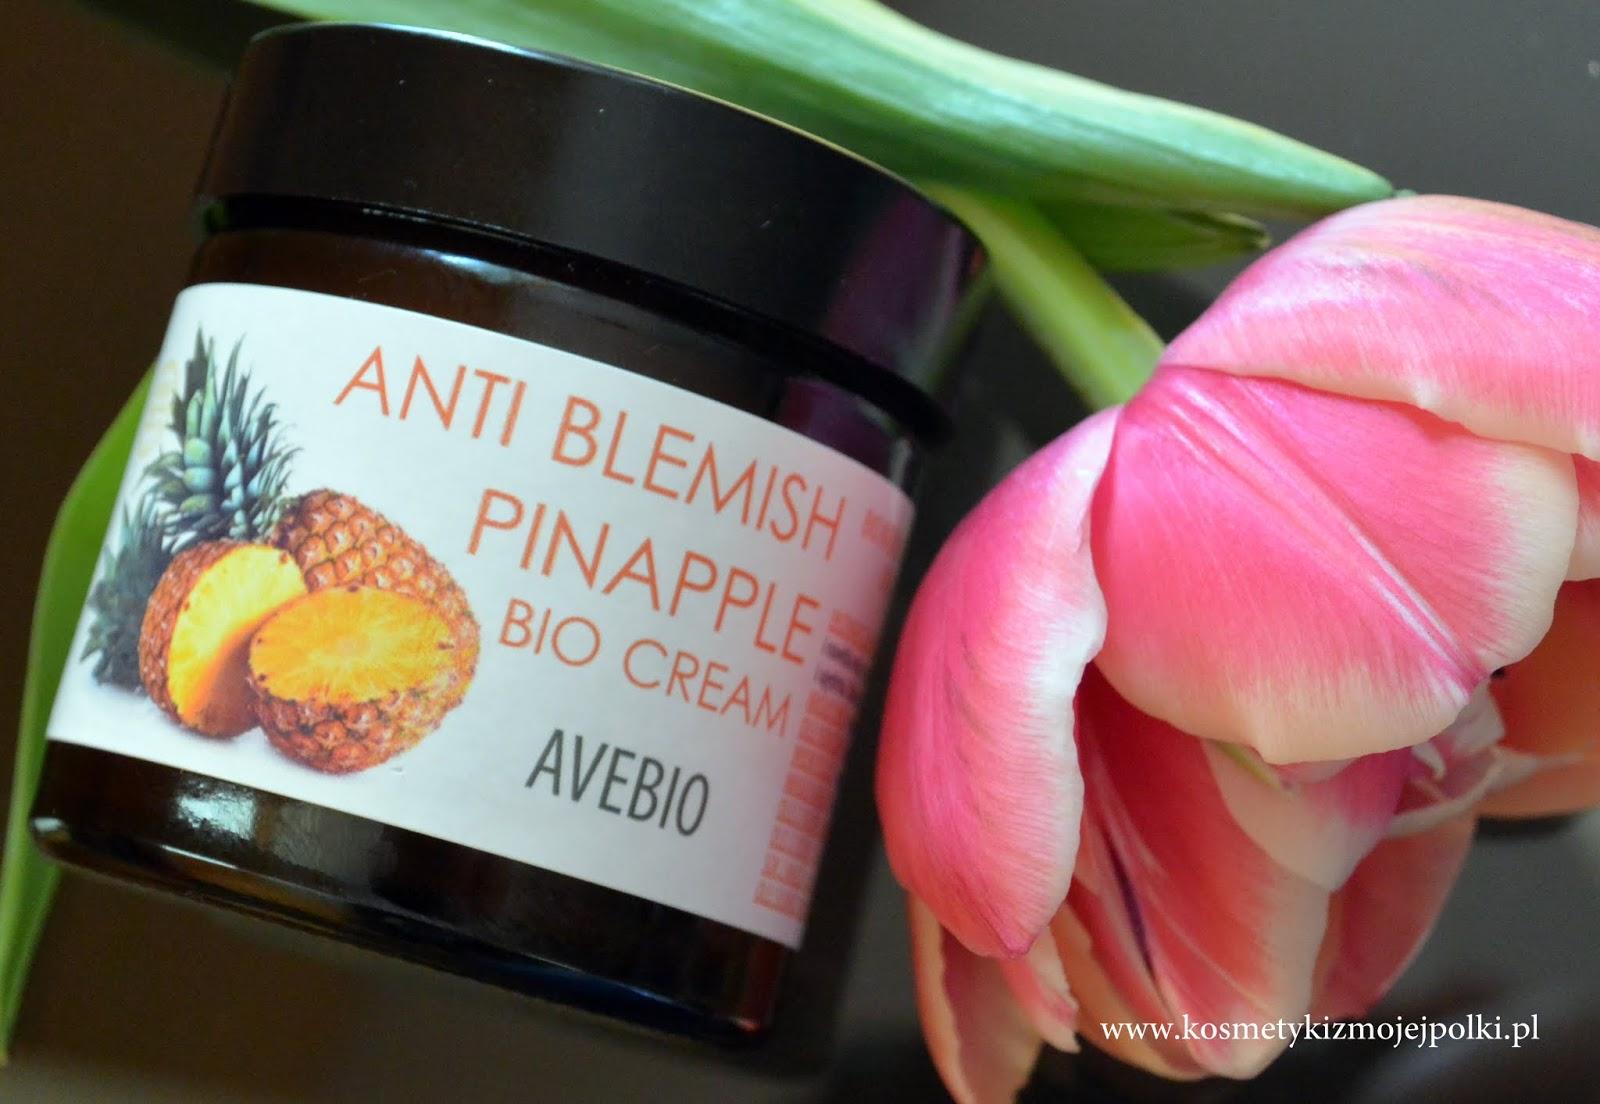 BIO krem do twarzy z ekstraktem z ananasa / AVEBIO Manufaktura Kosmetyki Naturalnej